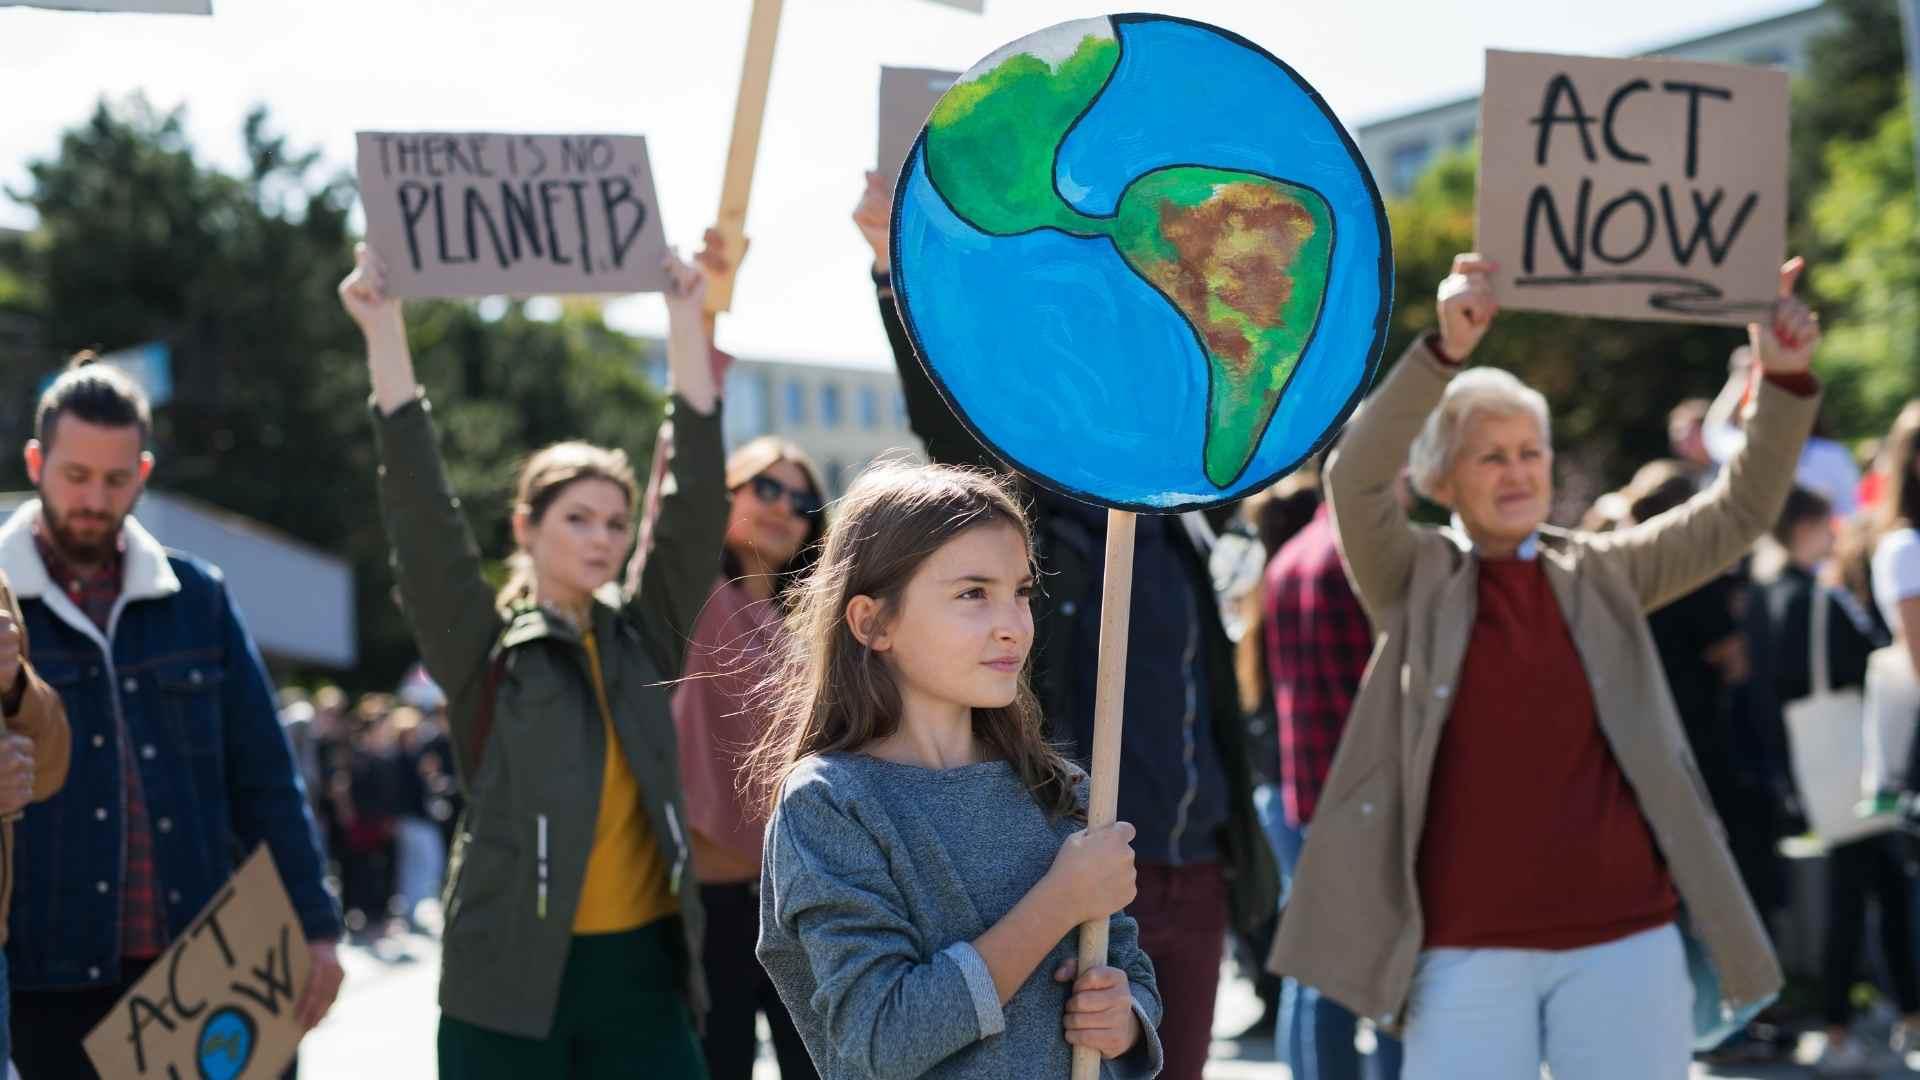 Investors call for mandatory climate risk disclosure